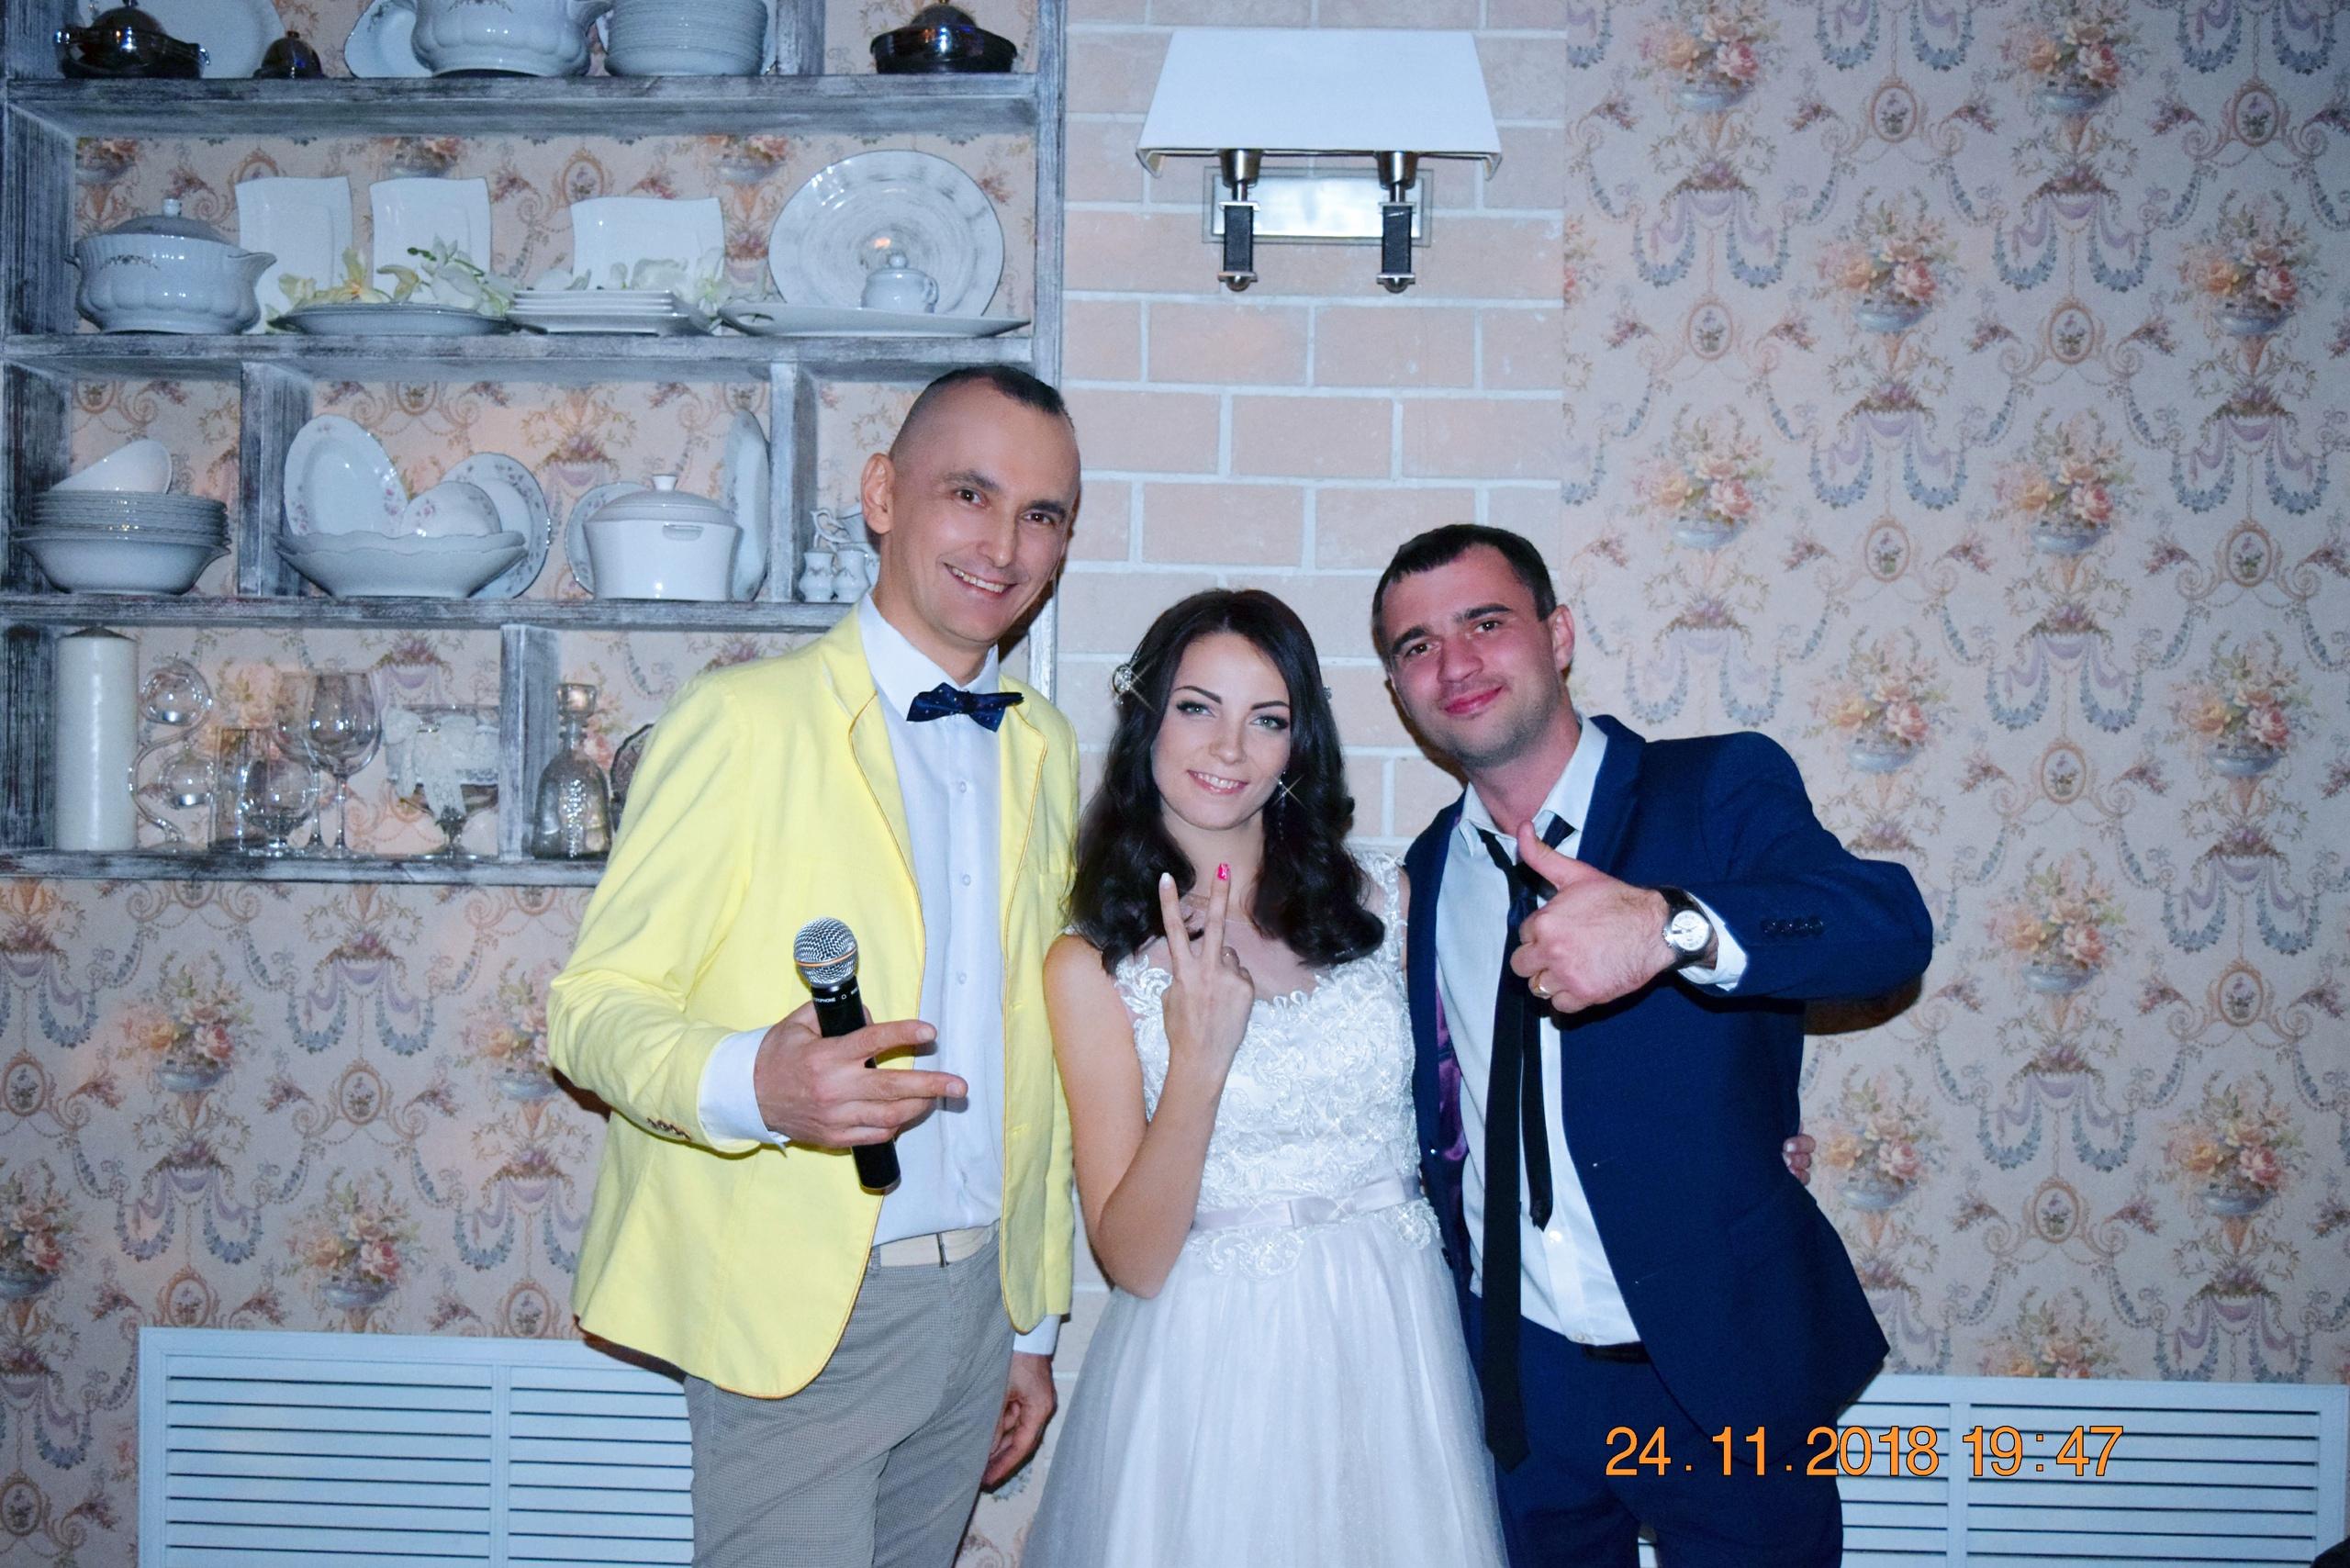 Mpiwvk xhR8 - Свадьба Артема и Ангелины